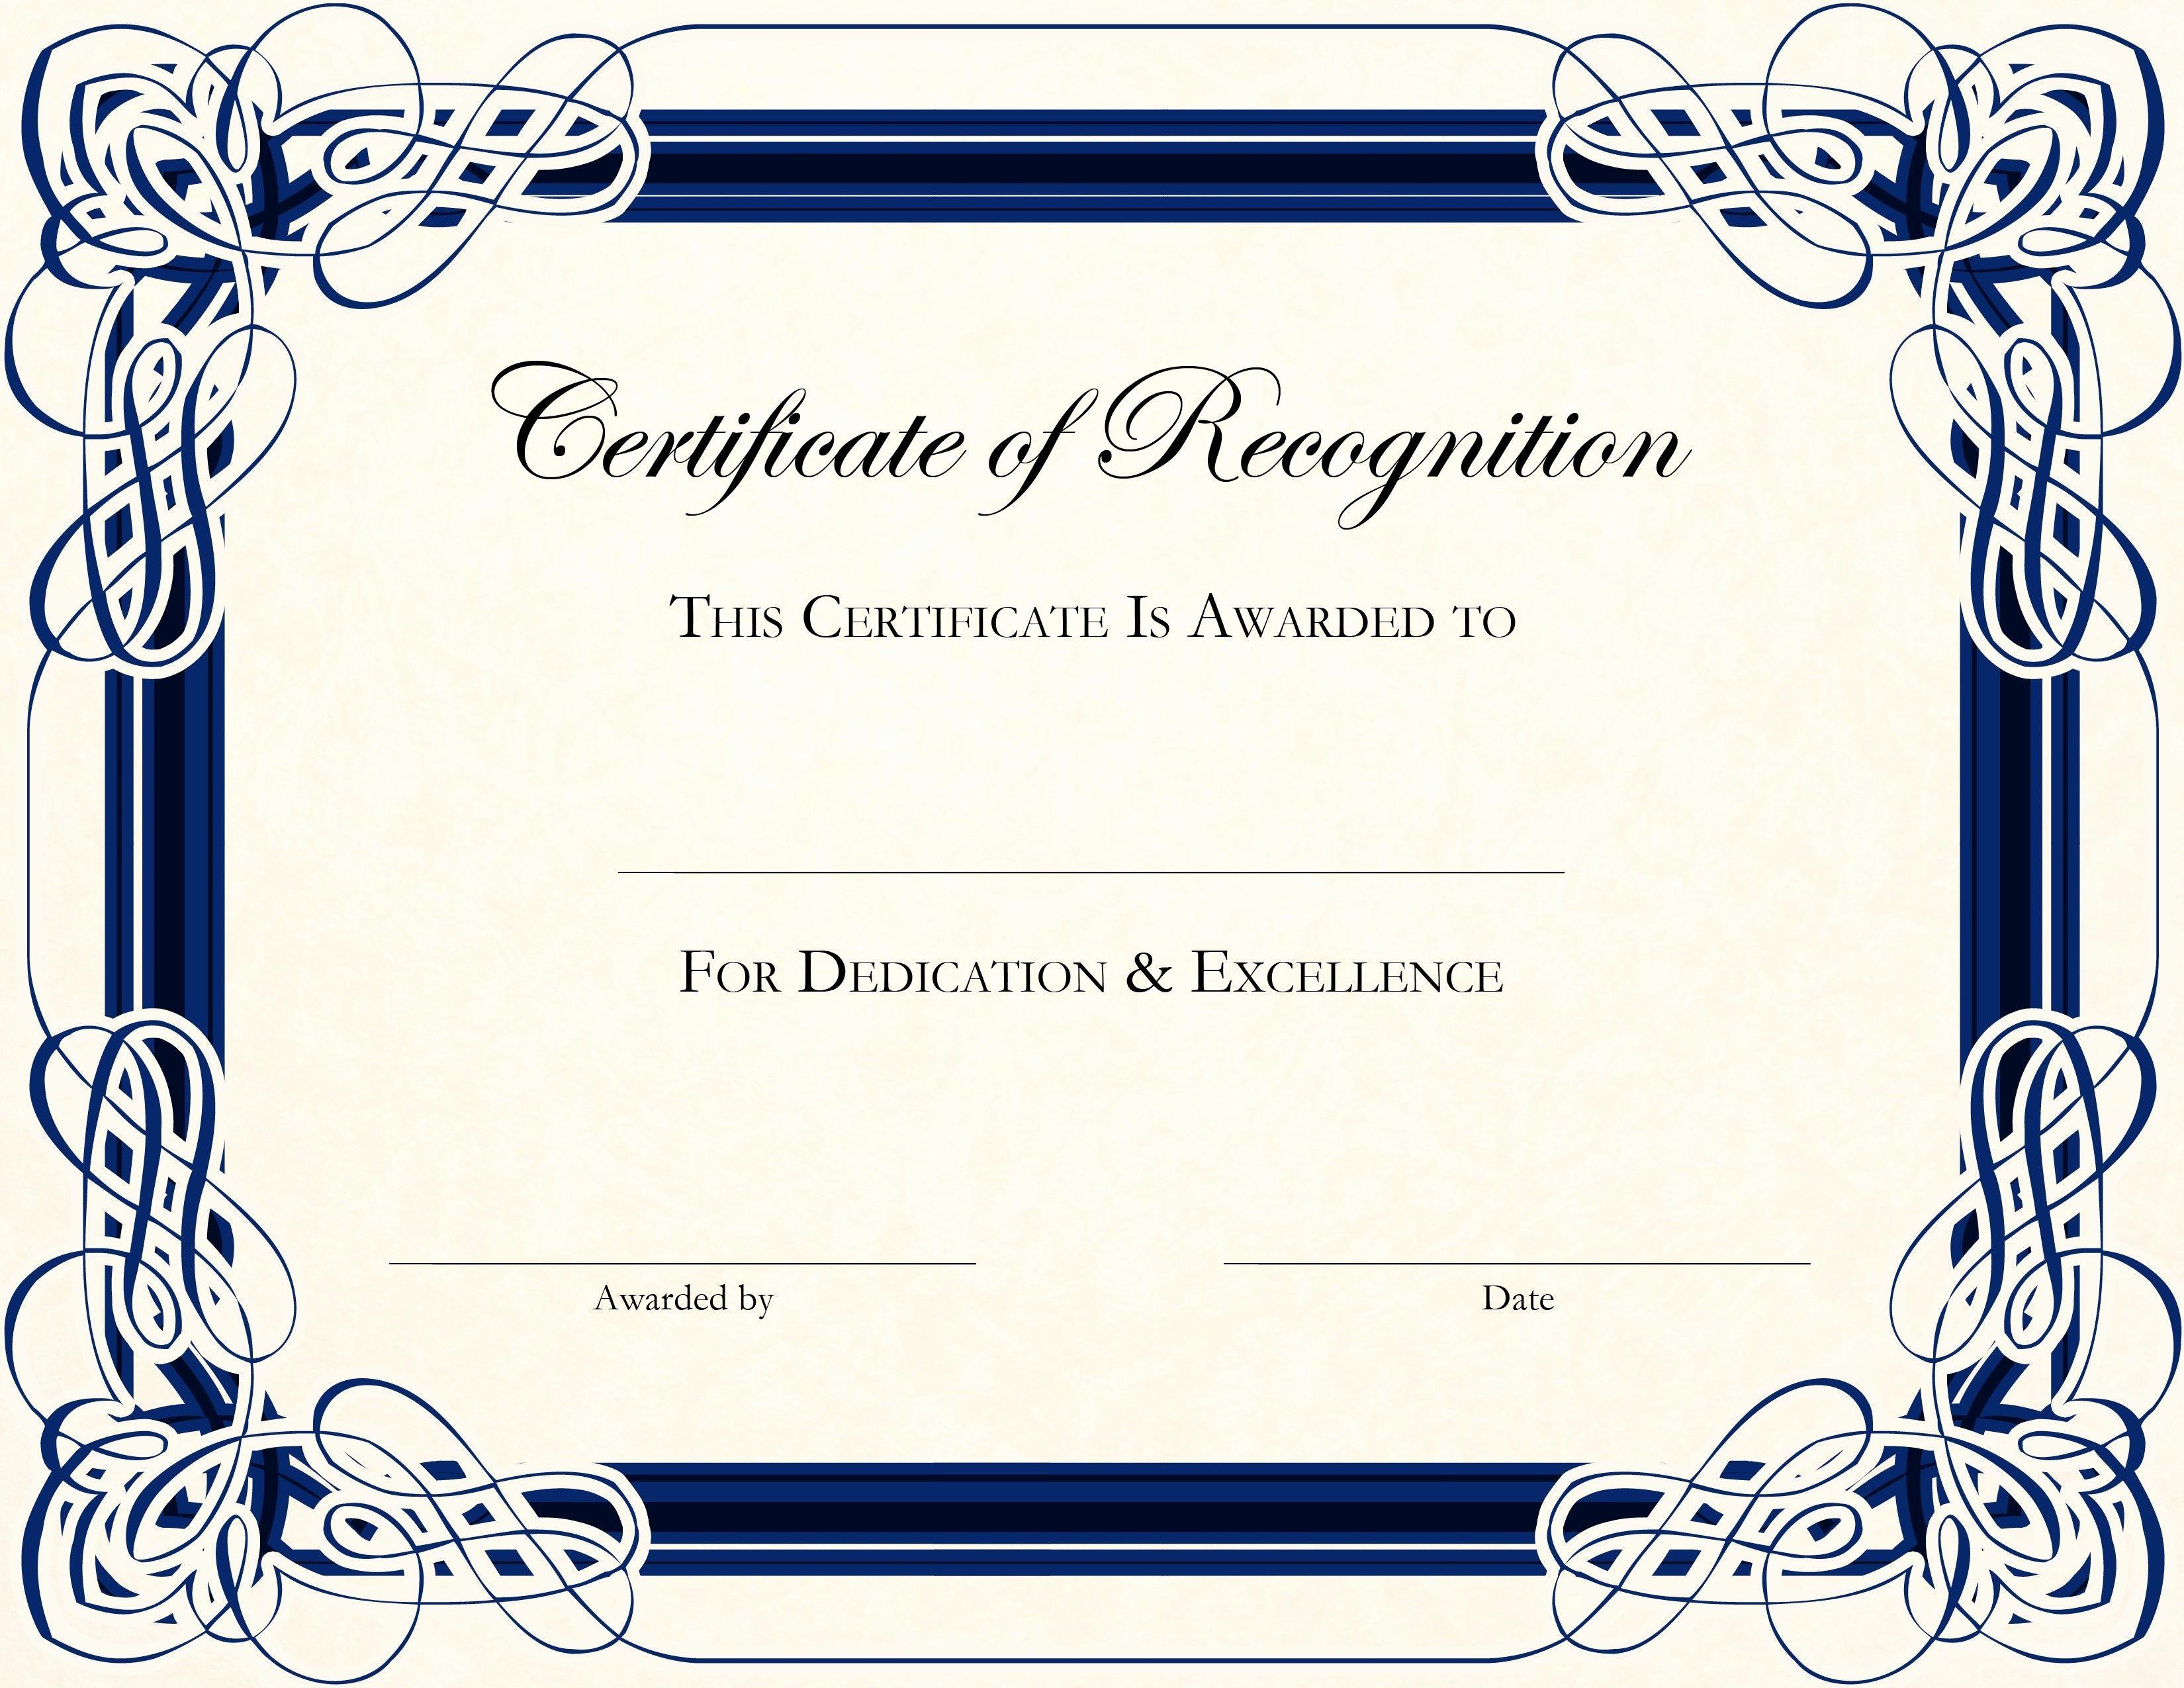 Printable Certificate Of Appreciation Template Fresh Free Printable Certificate Templates for Teachers